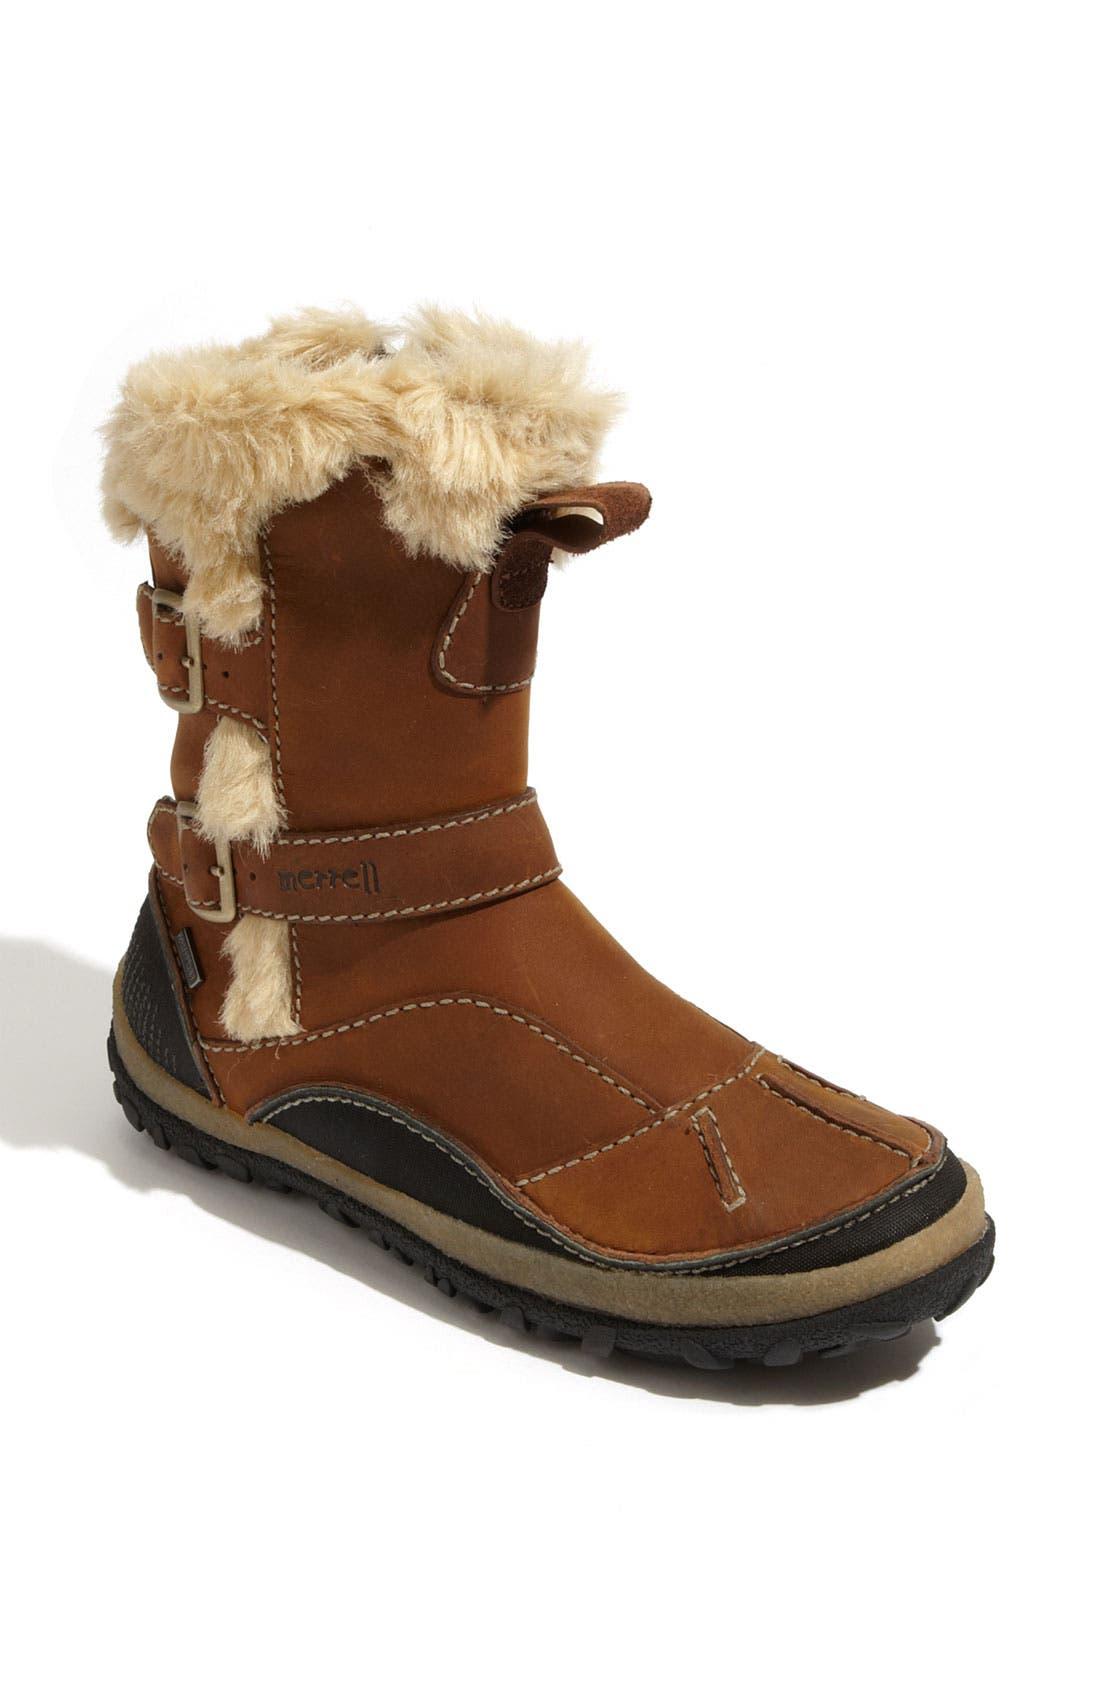 Alternate Image 1 Selected - Merrell 'Taiga' Buckle Boot